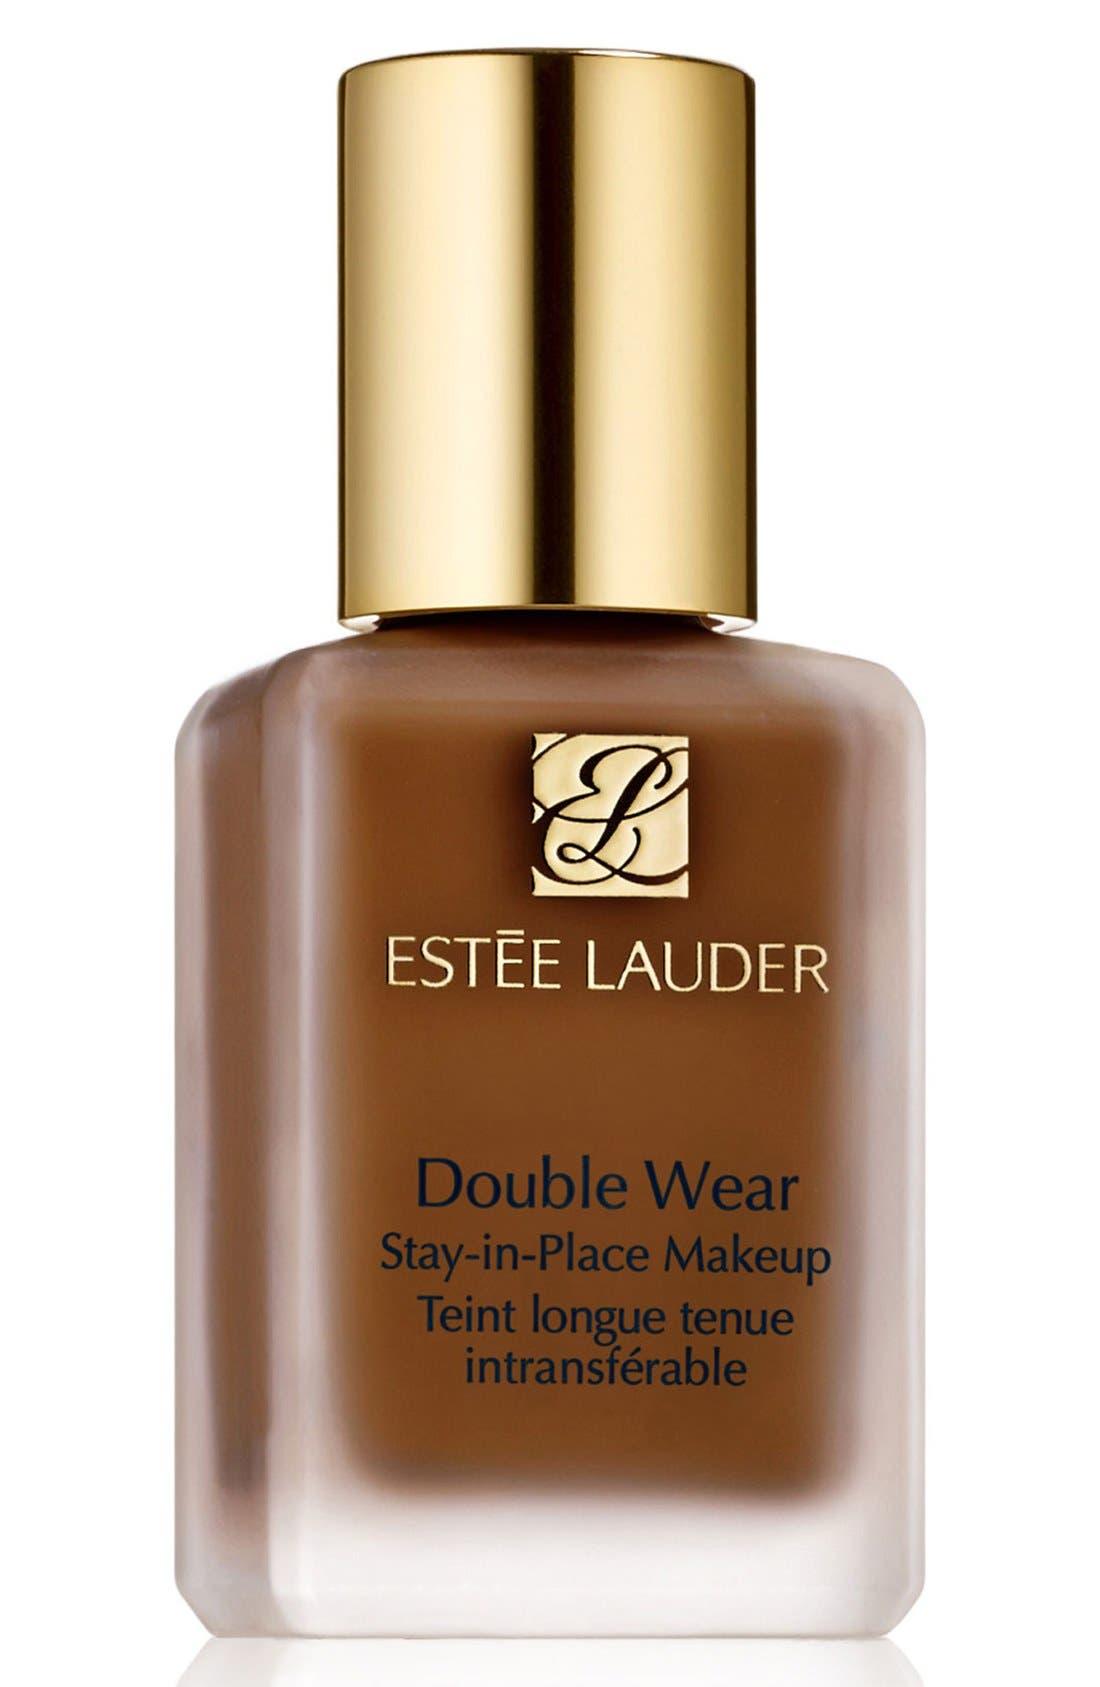 Estee Lauder Double Wear Stay-In-Place Liquid Makeup - 7W1 Deep Spice